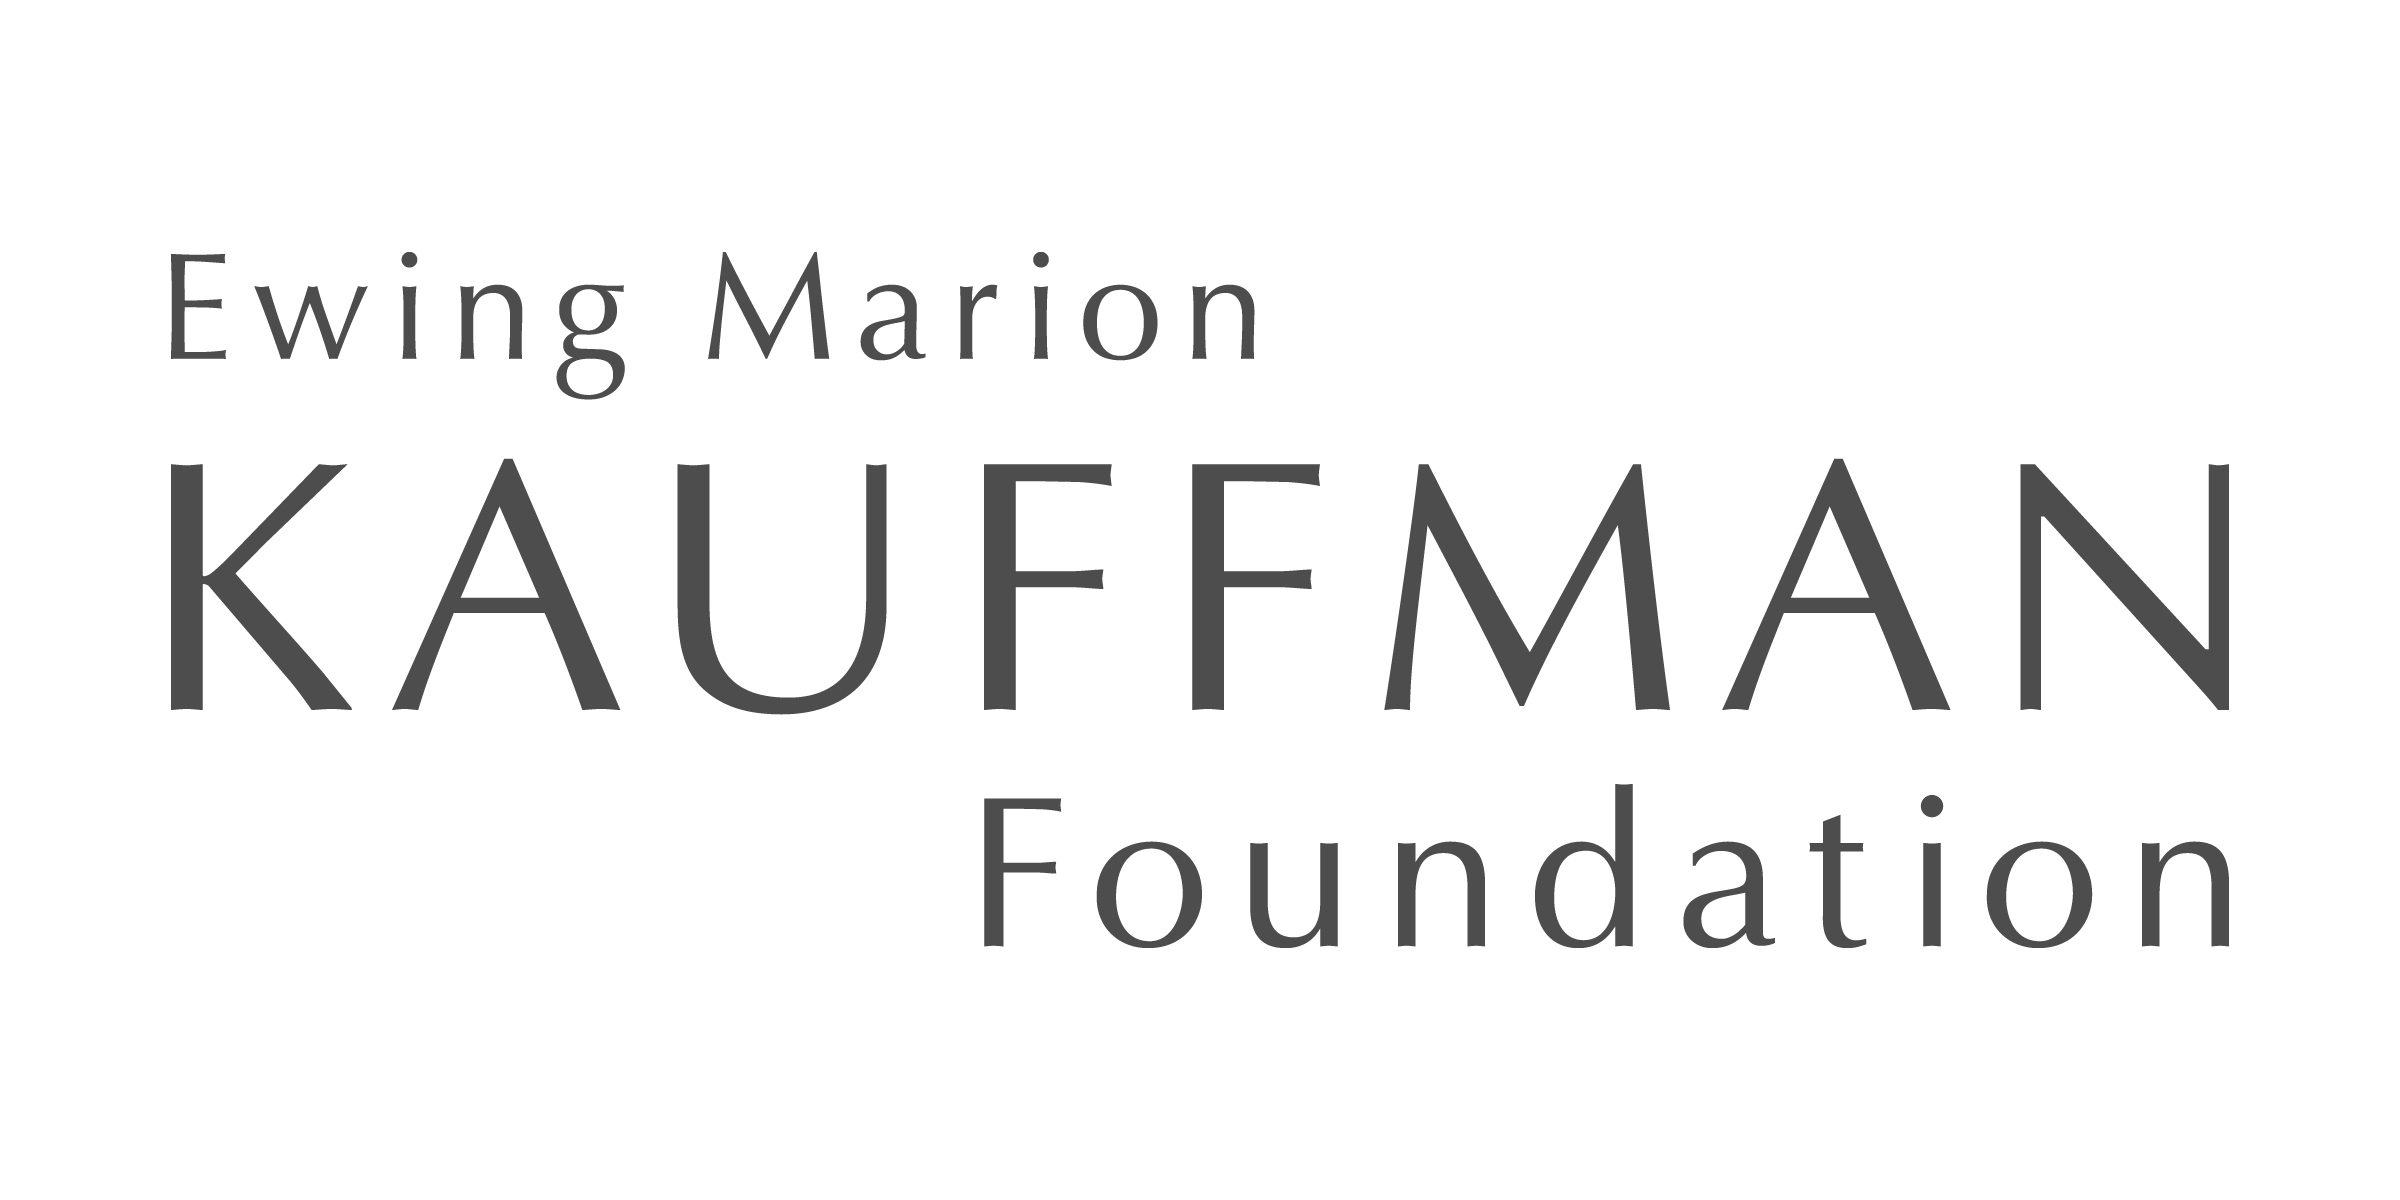 http://gflec.org/wp-content/uploads/2016/01/Kauffman-EMKF_Gray70K.jpg